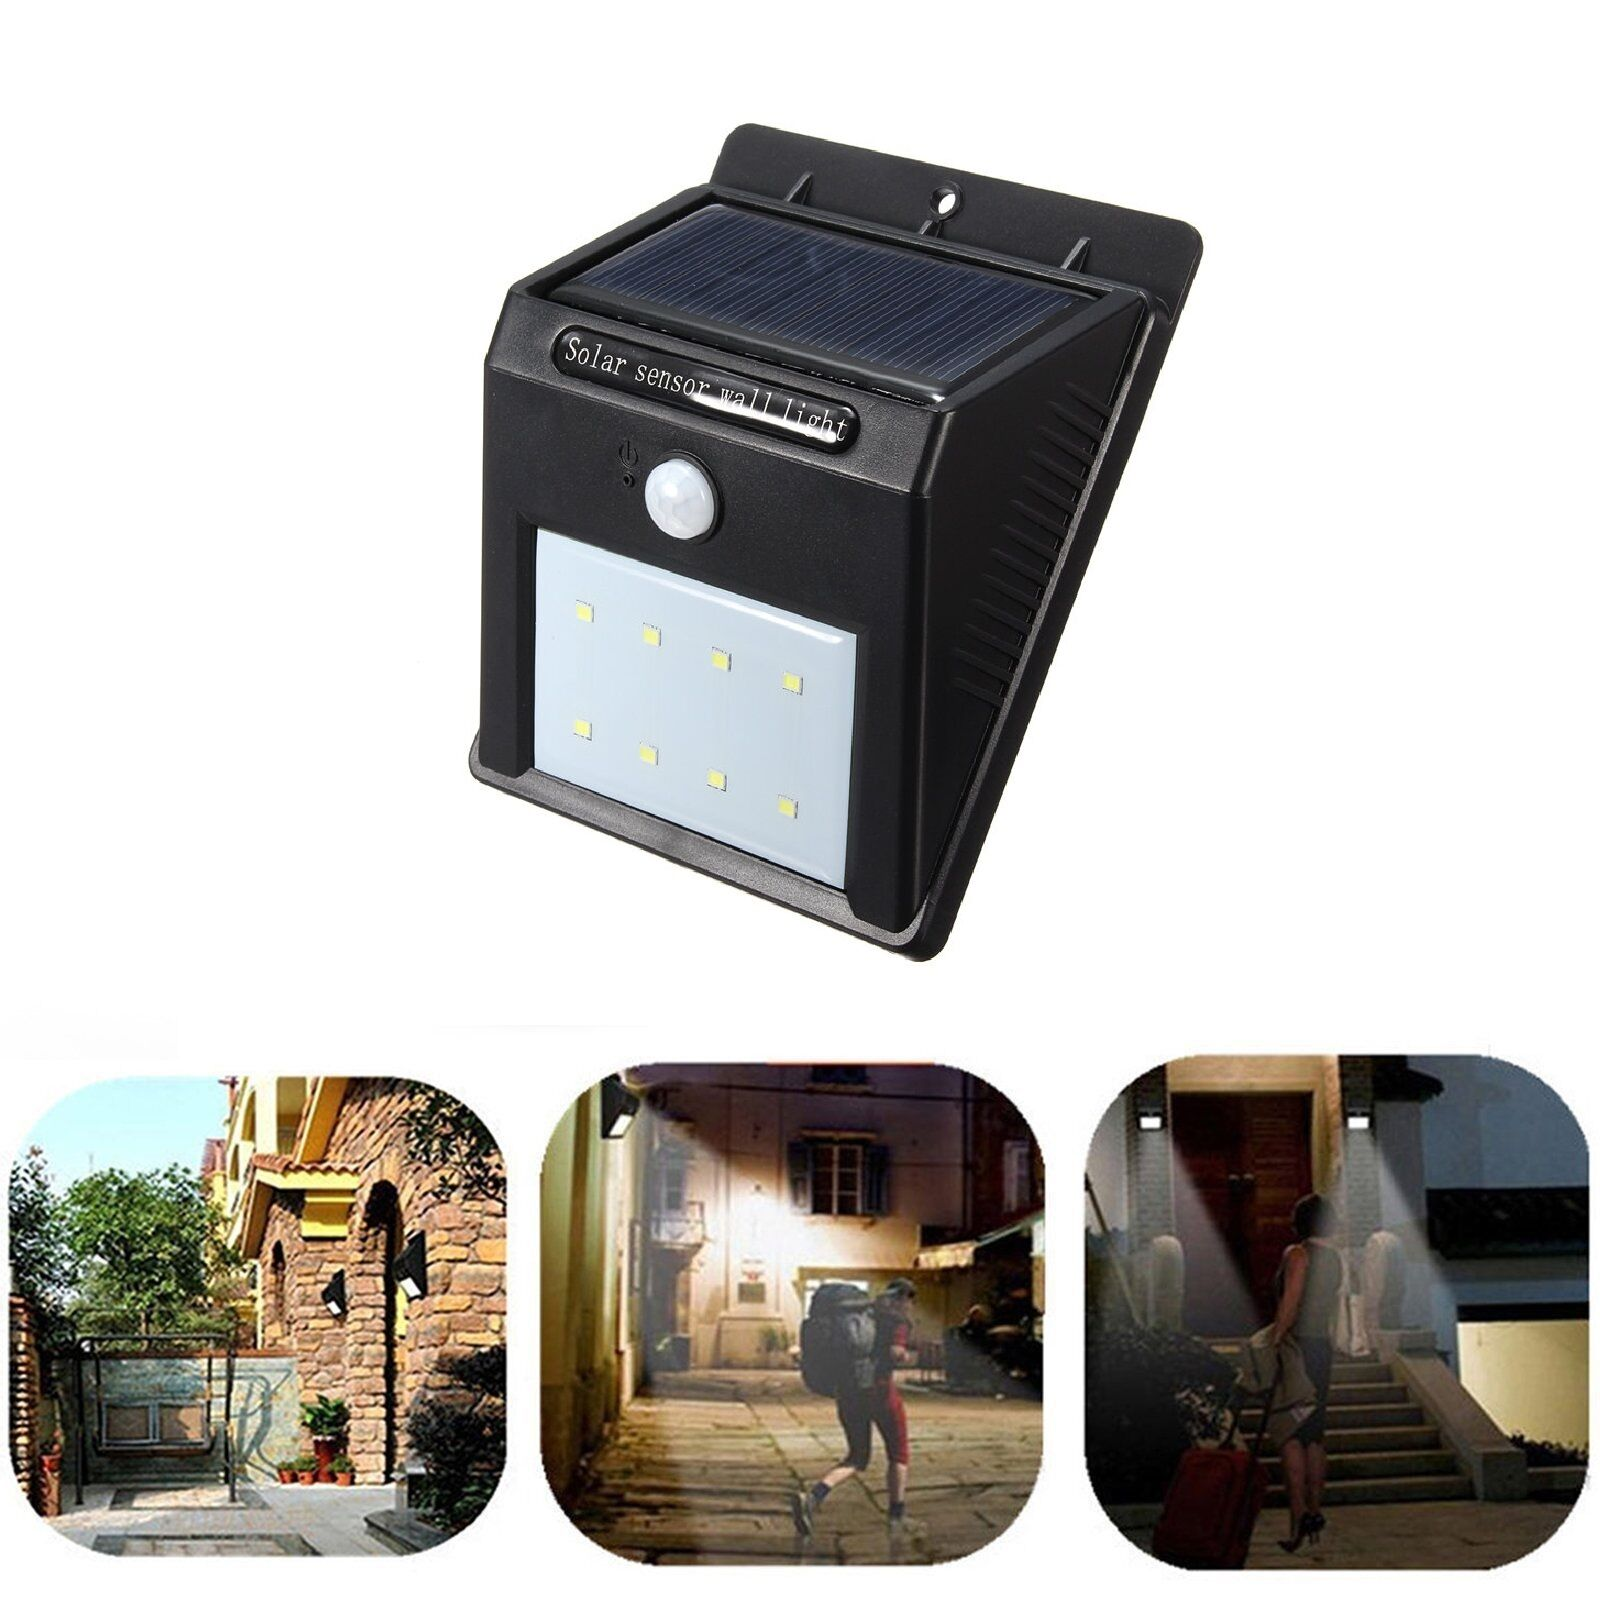 Outdoor Motion Light Will Not Turn Off: 2-16LEDs Solar Power PIR Motion Sensor Wall Light Outdoor